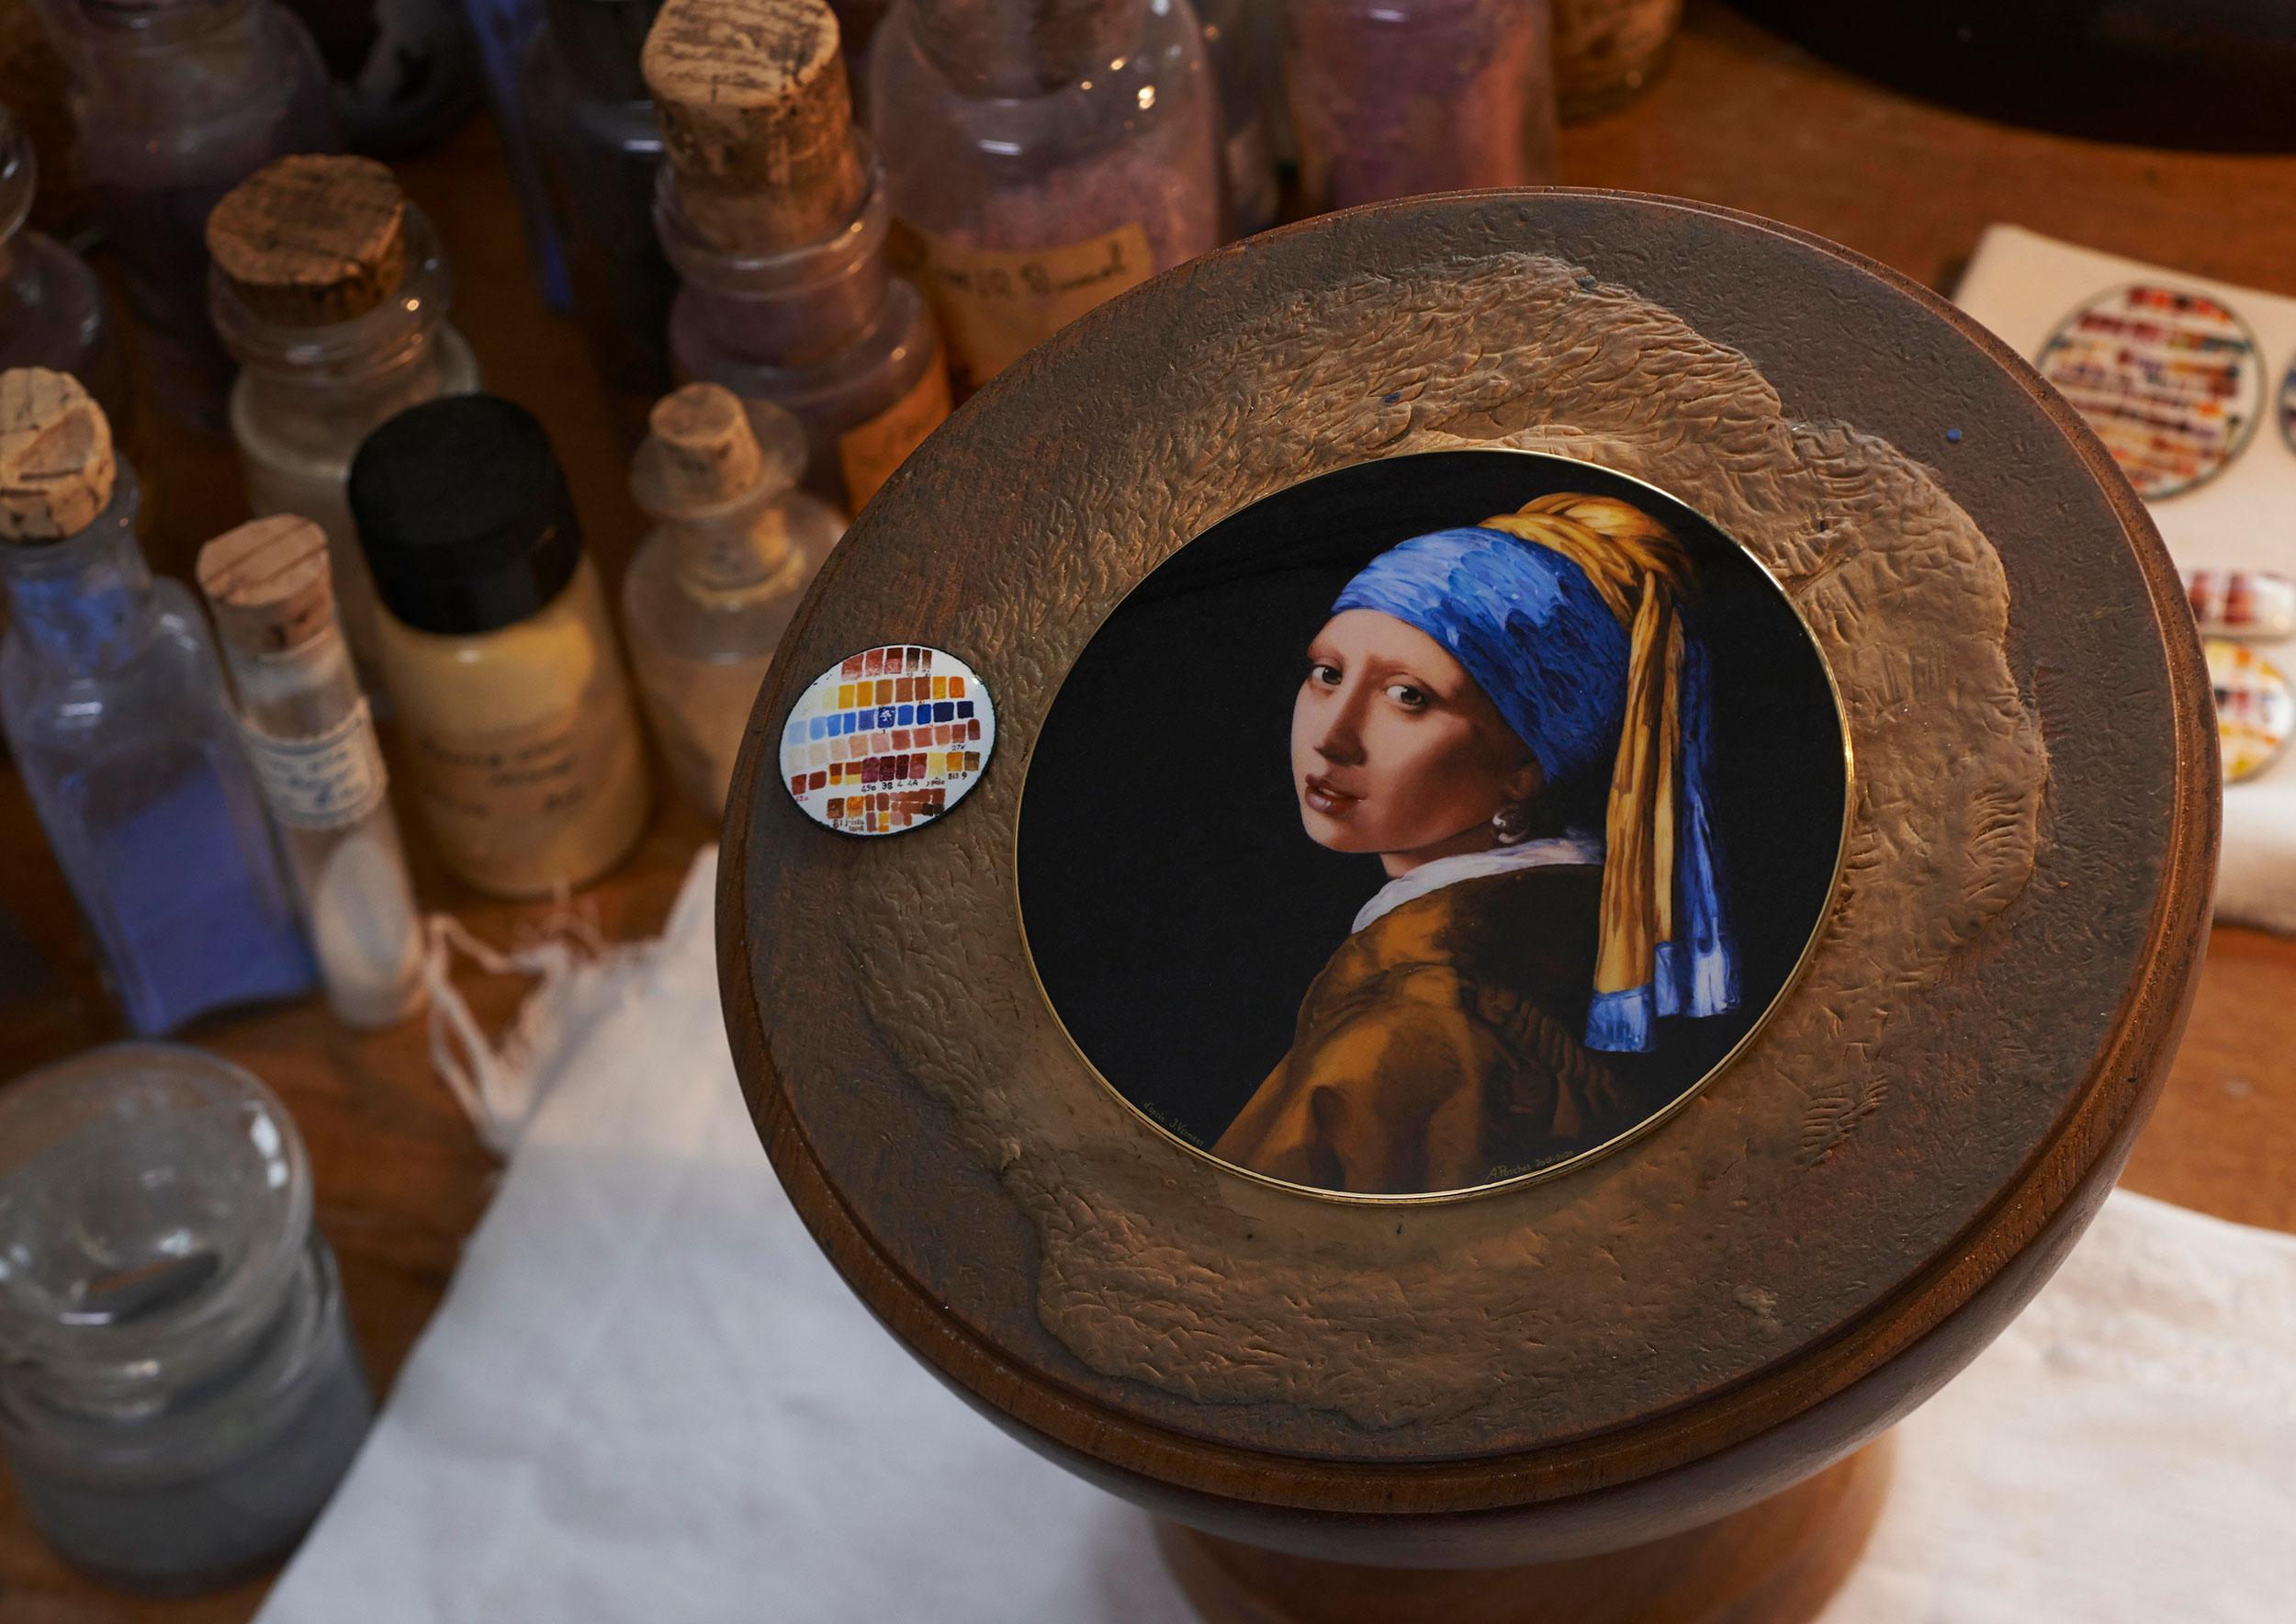 Proceso de pintura del Vacheron Constantin Les Cabinotiers Westminster Sonnerie – Tribute to Johannes Vermeer